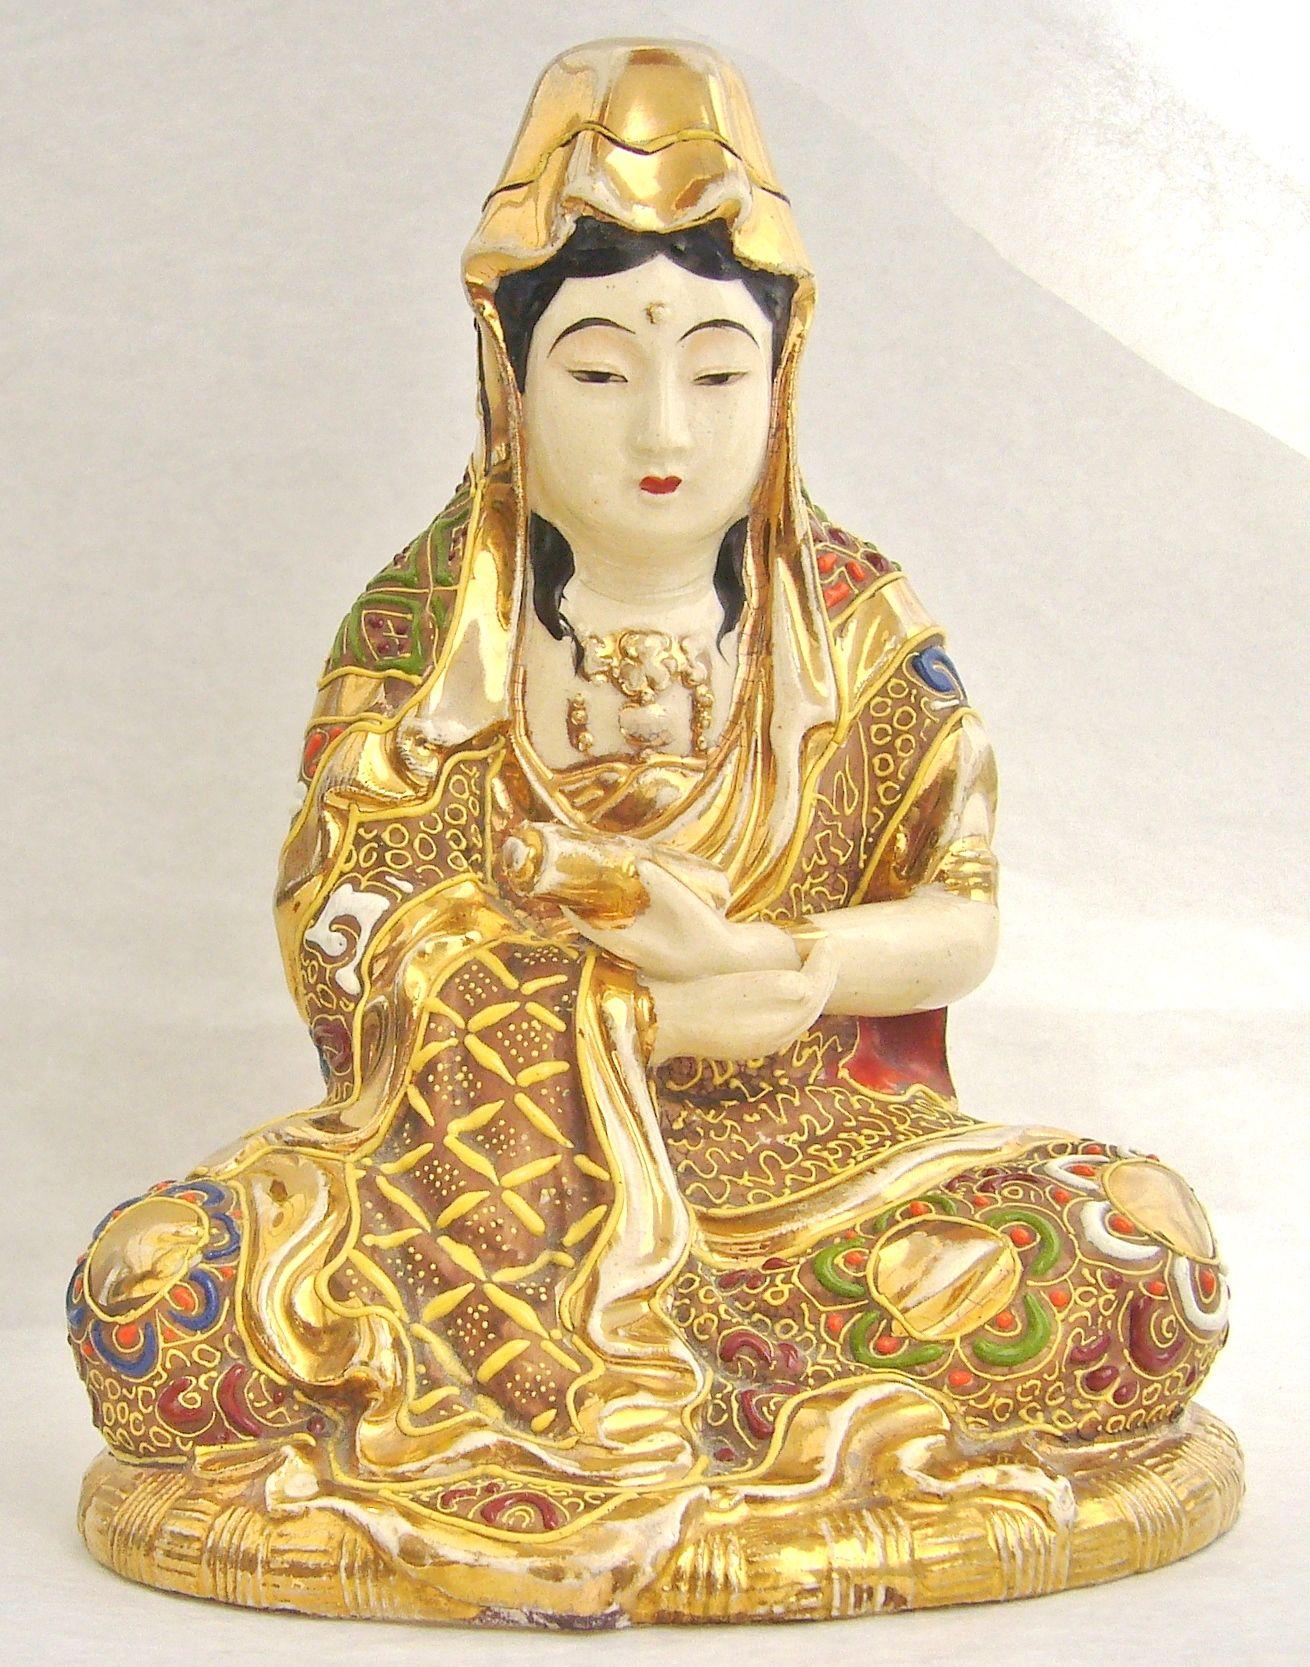 Japanese antique Satsuma pottery seated girl